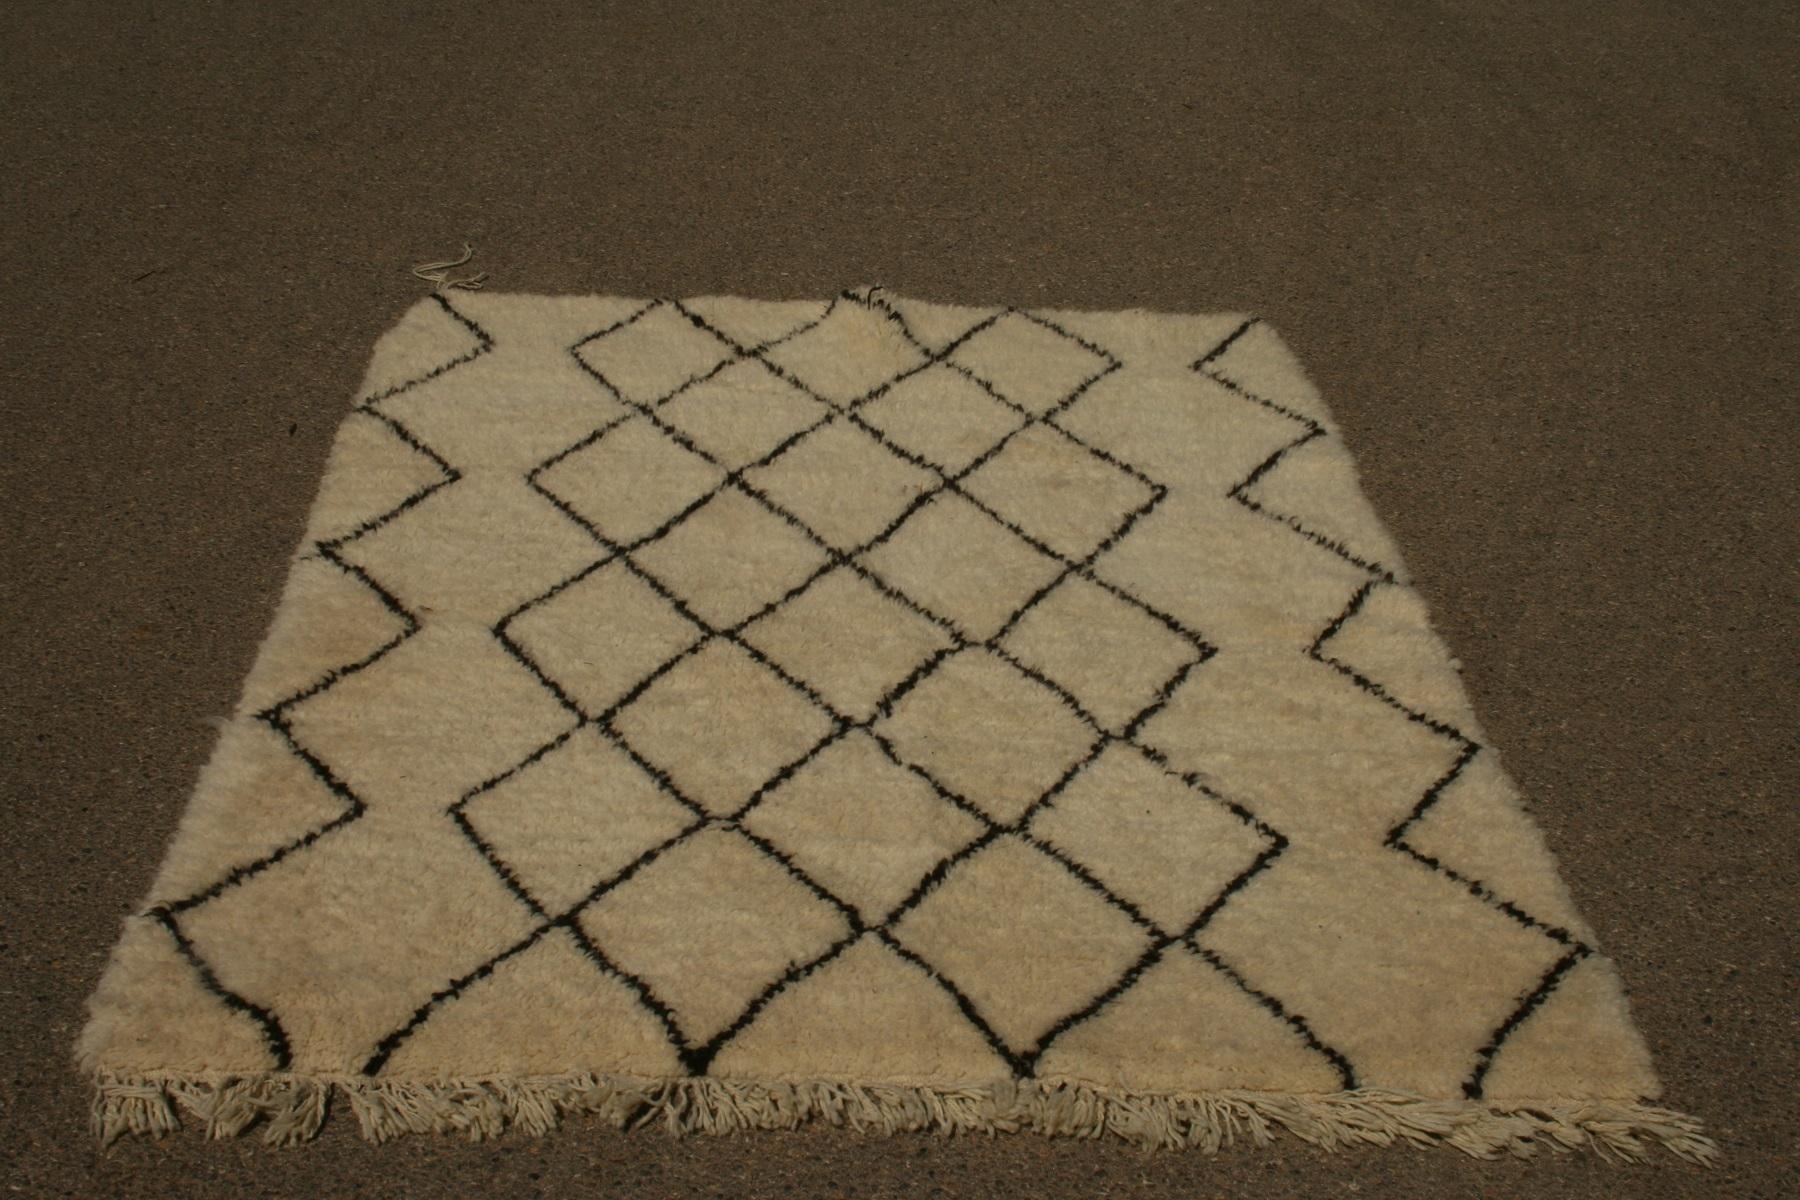 Klein Beni Ouarain vloerkleed uit Marokko 200cm x 154cm (nr 3245) (kleed wordt begin oktober in Nederland verwacht)